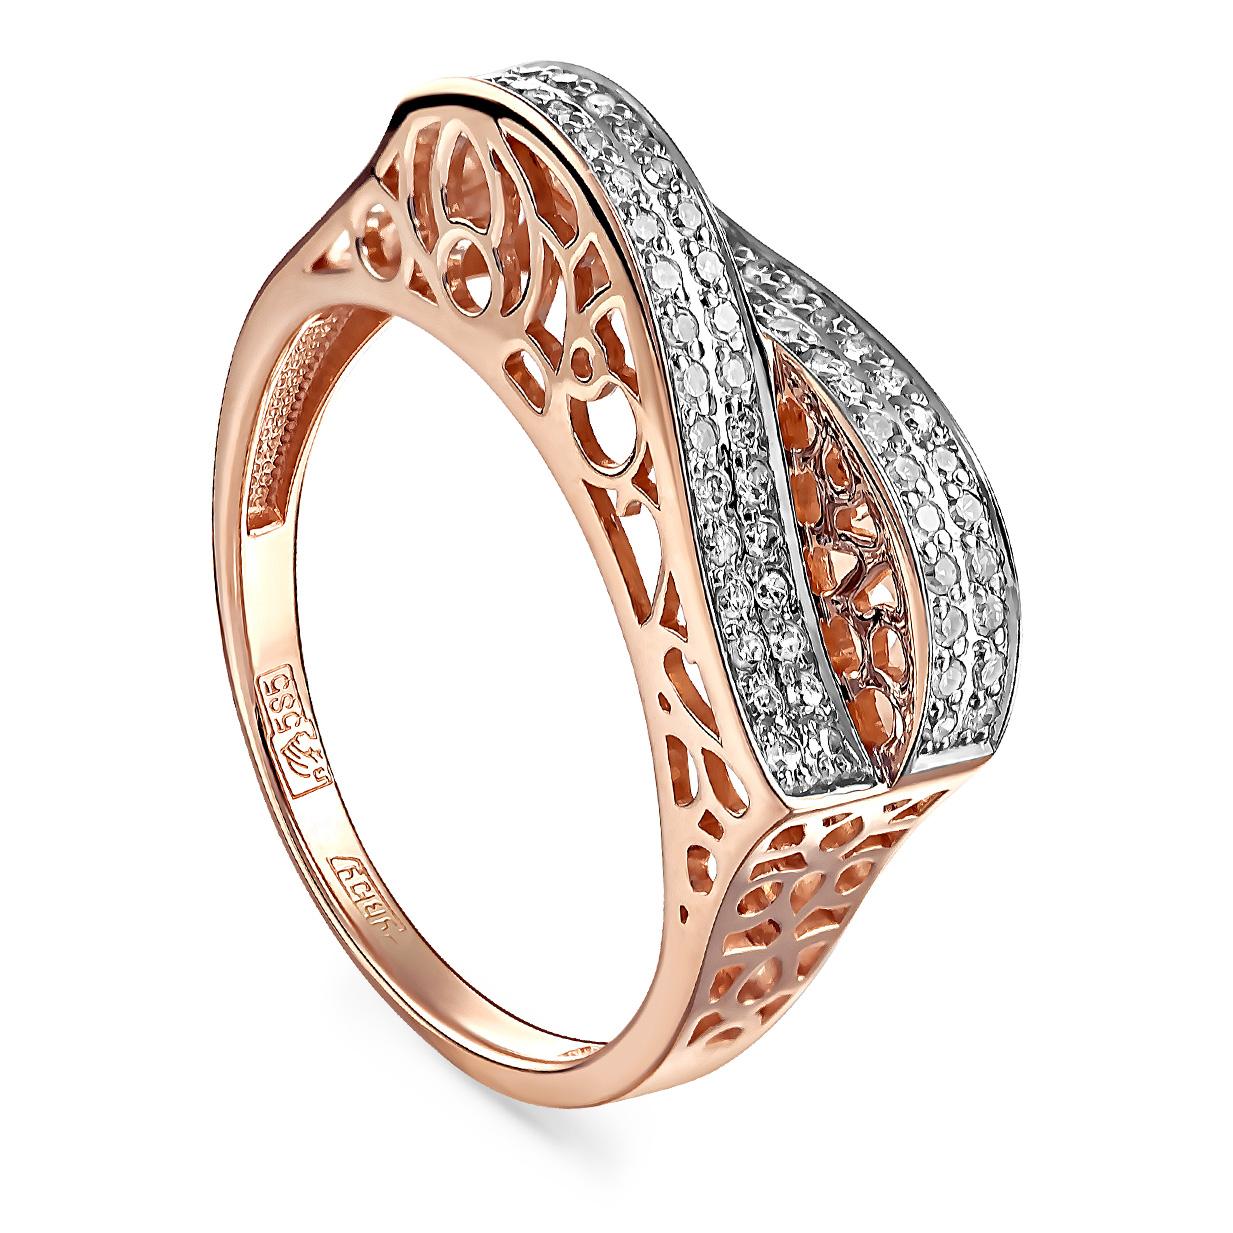 Золотое кольцо Бриллиант арт. 1-0492-1000 1-0492-1000